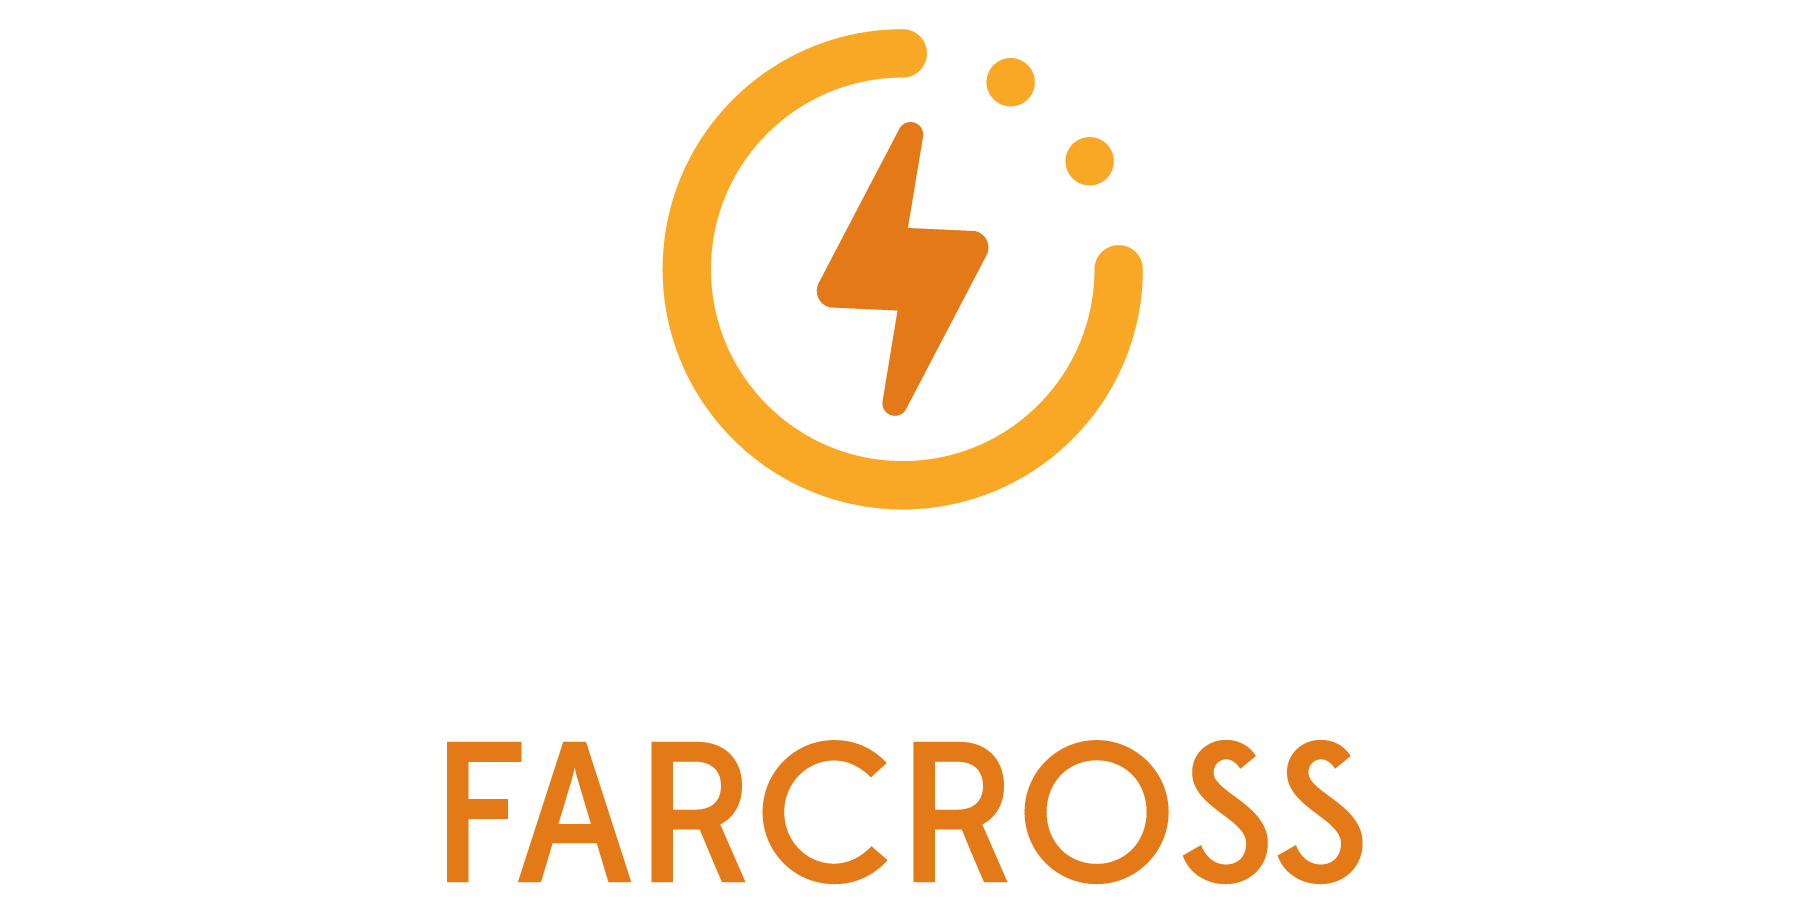 FARCROSS